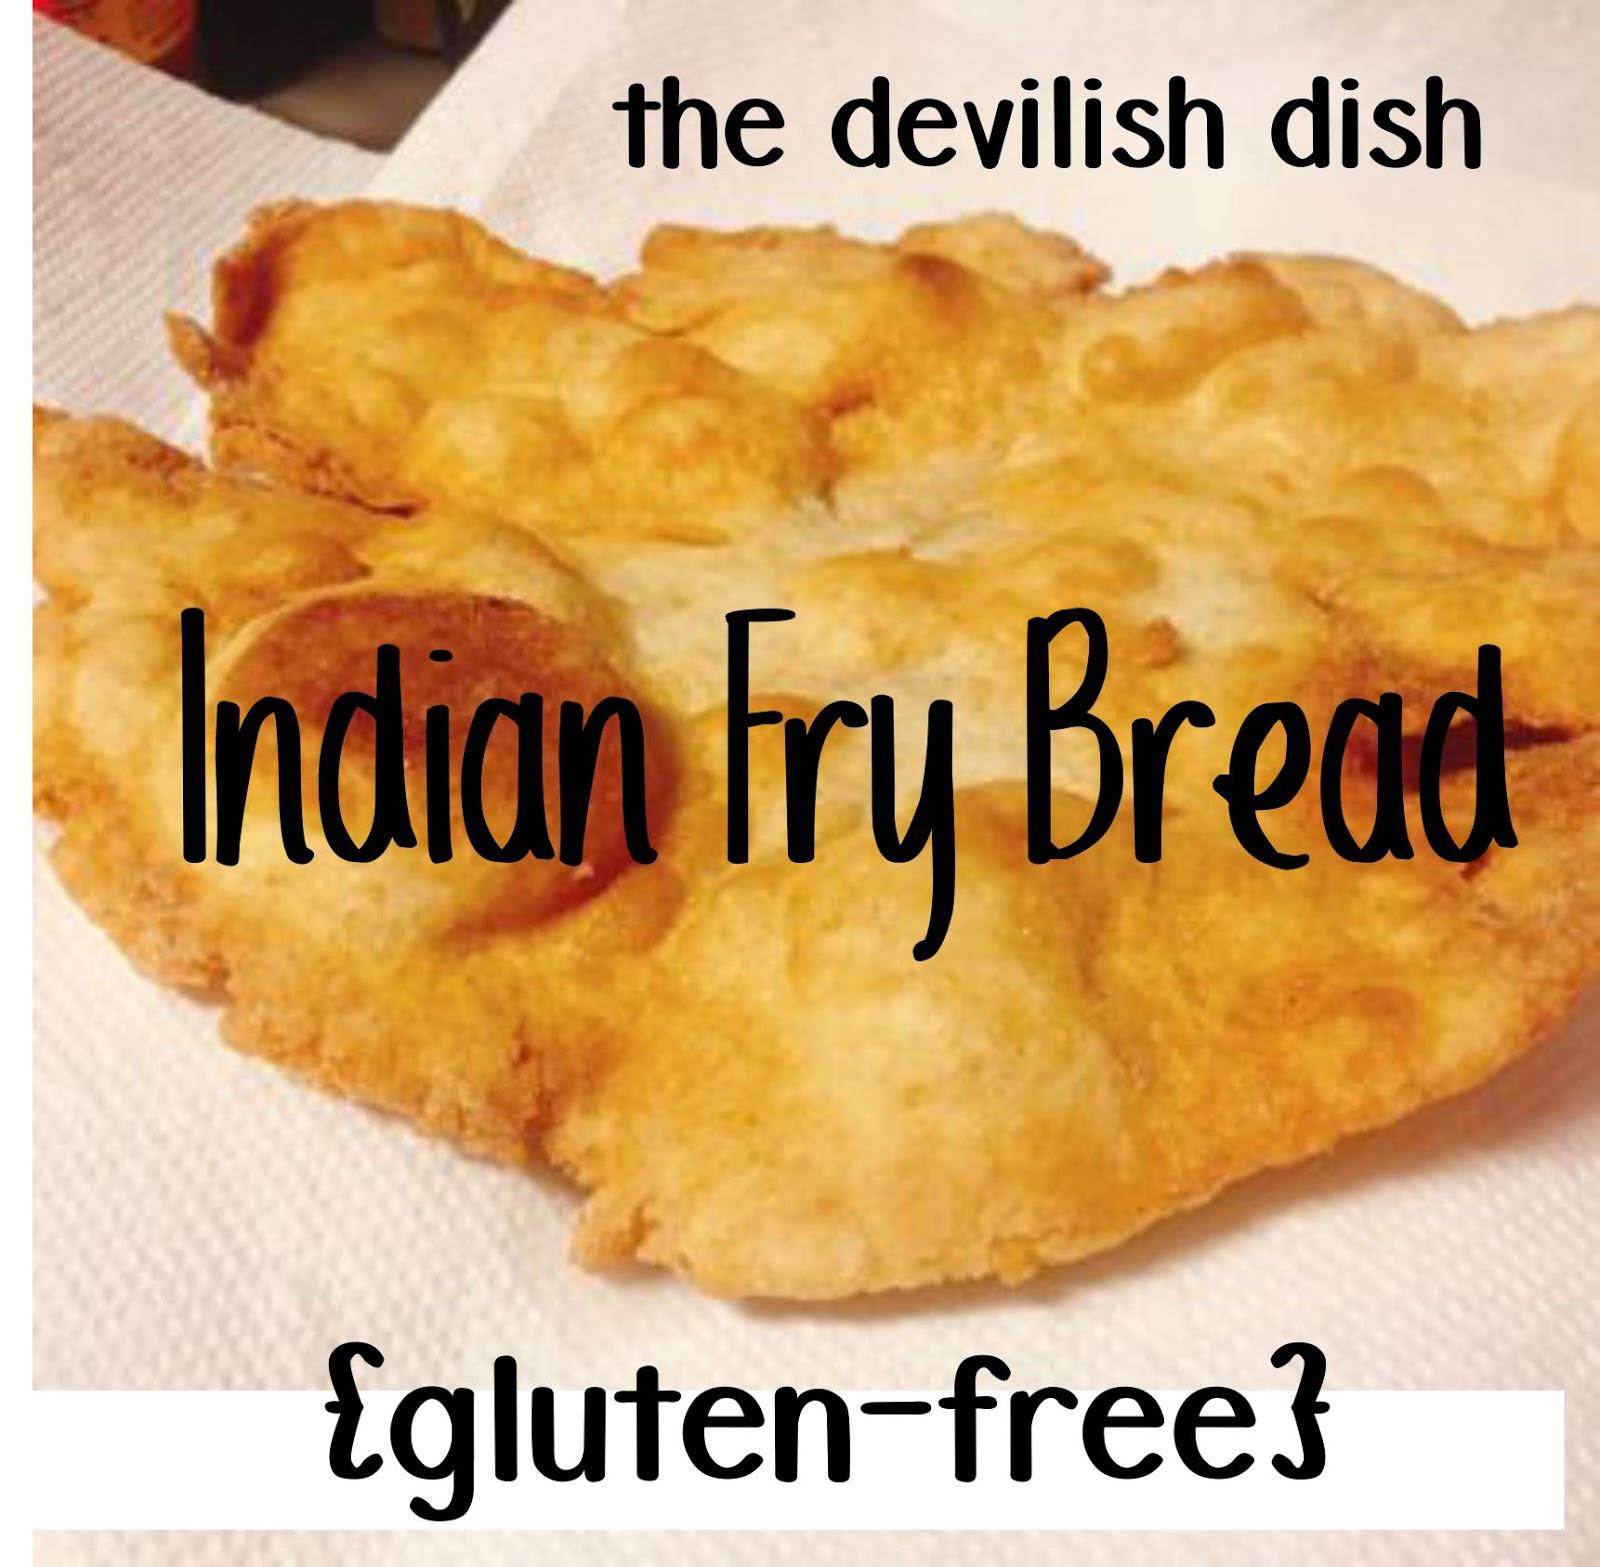 Gluten Free Indian Bread  The Devilish Dish Gluten Free Indian Fry Bread